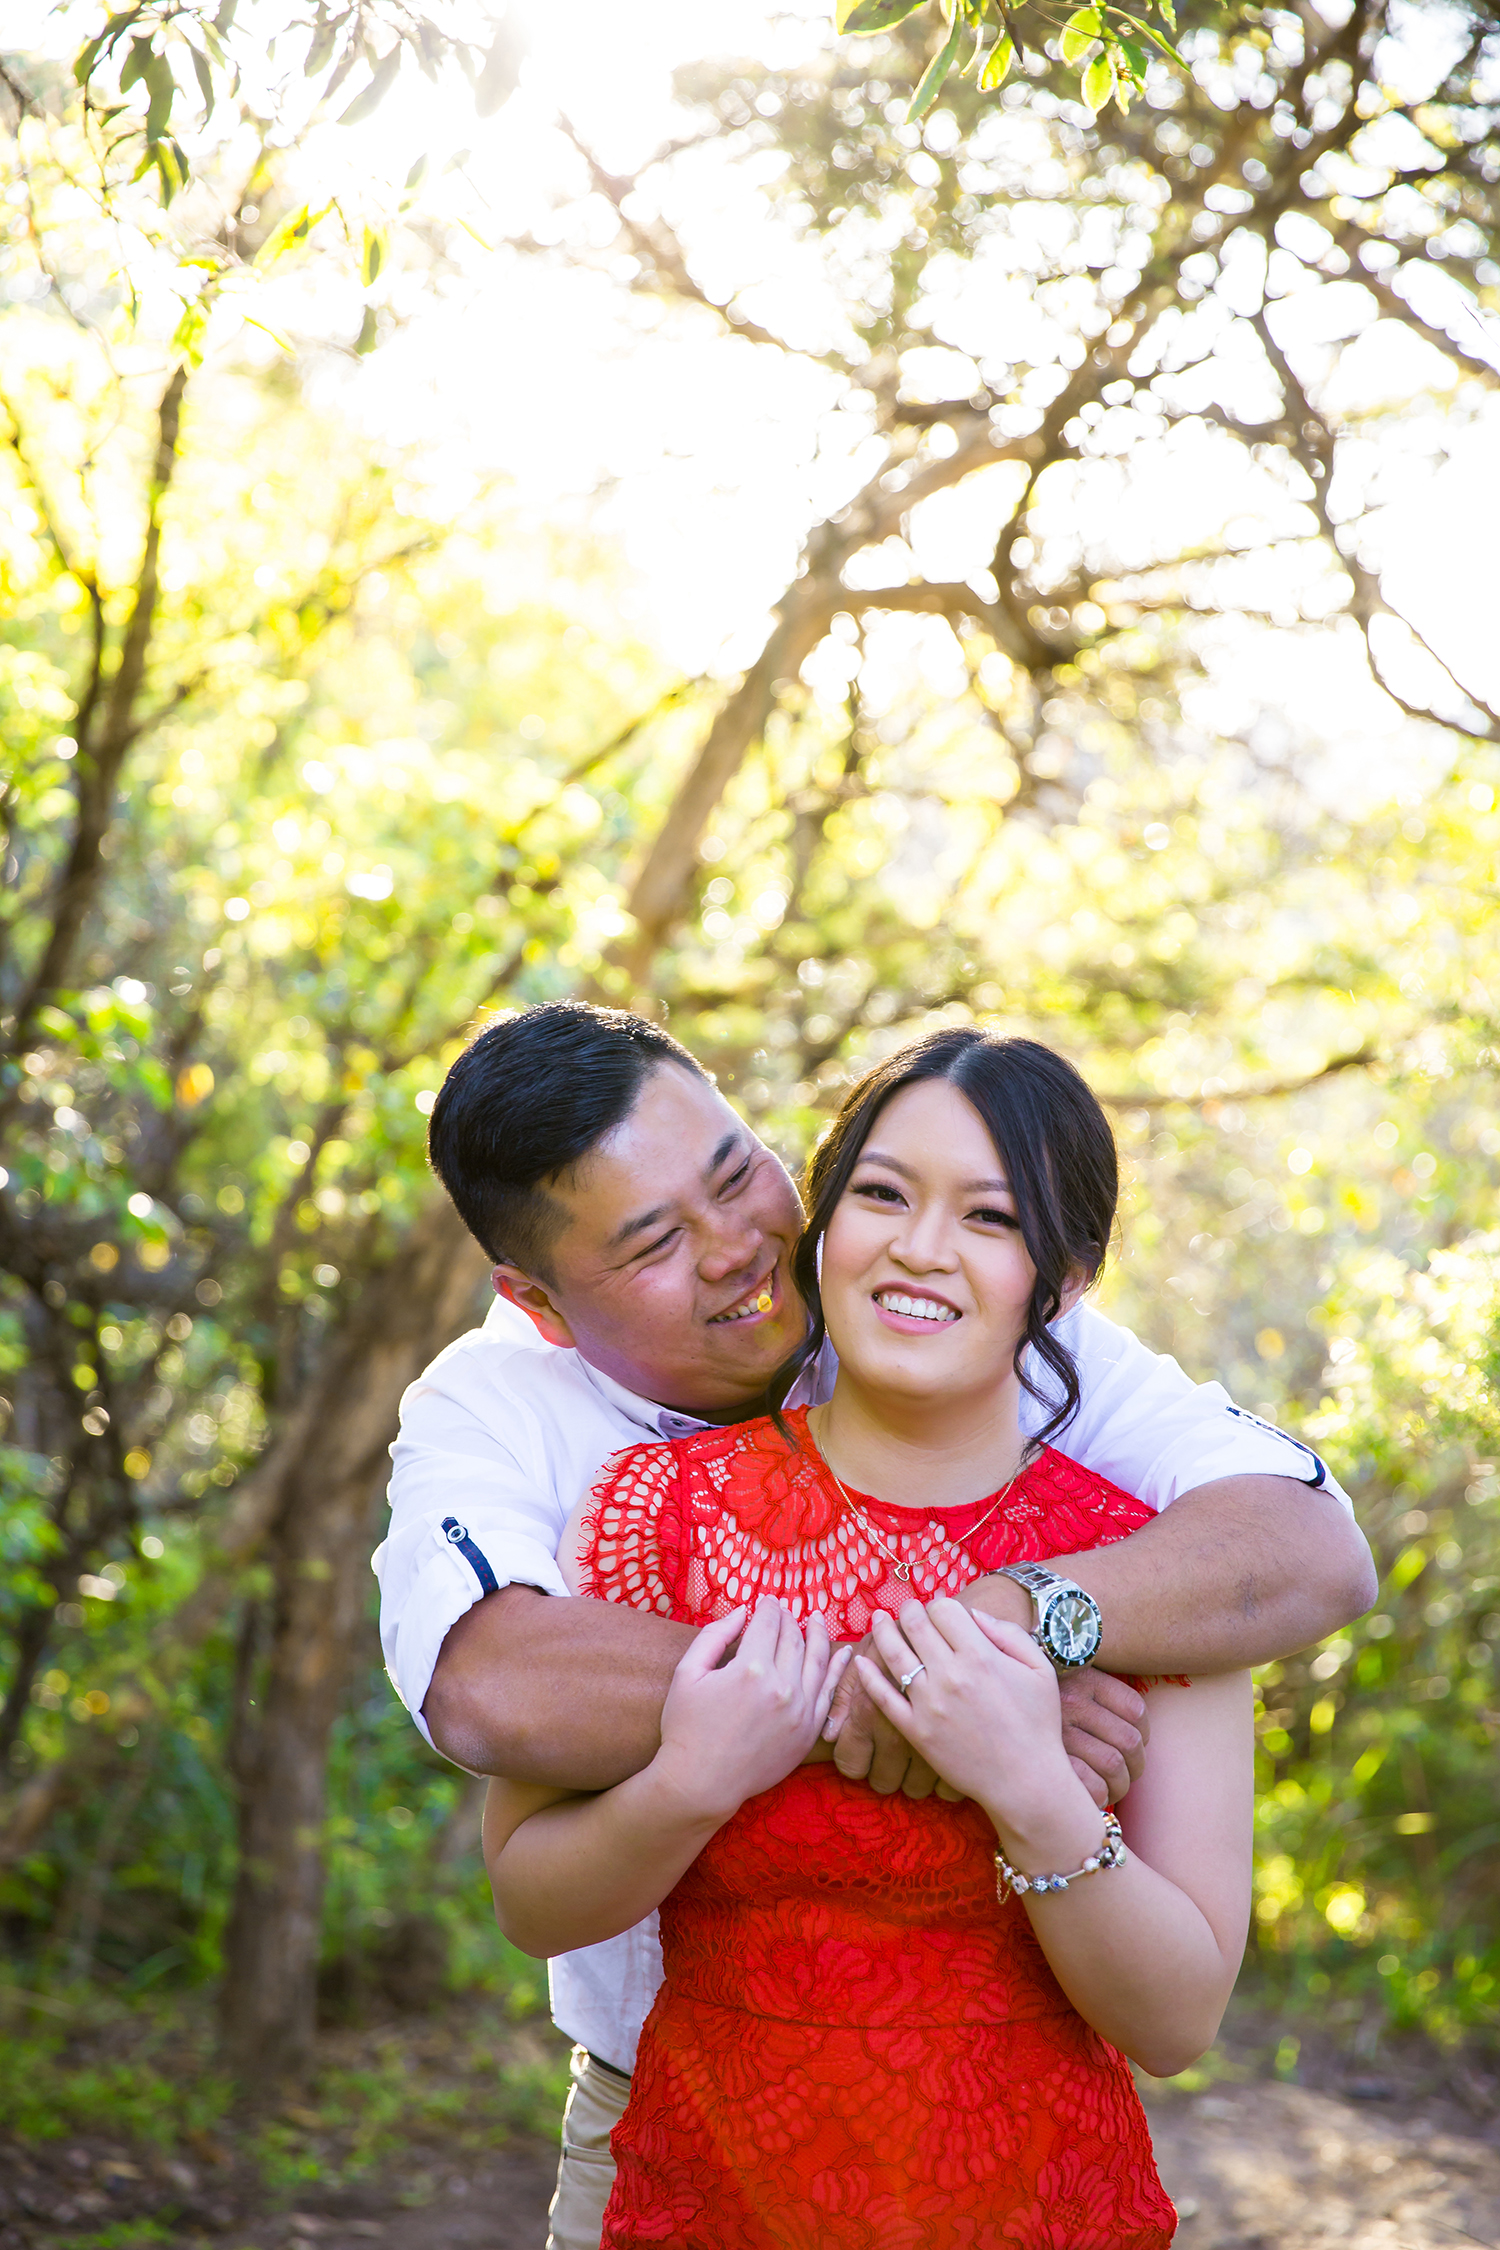 Shelly Beach Manly Pre-Wedding Engagement Session - jennifer Lam Photography (11).jpg